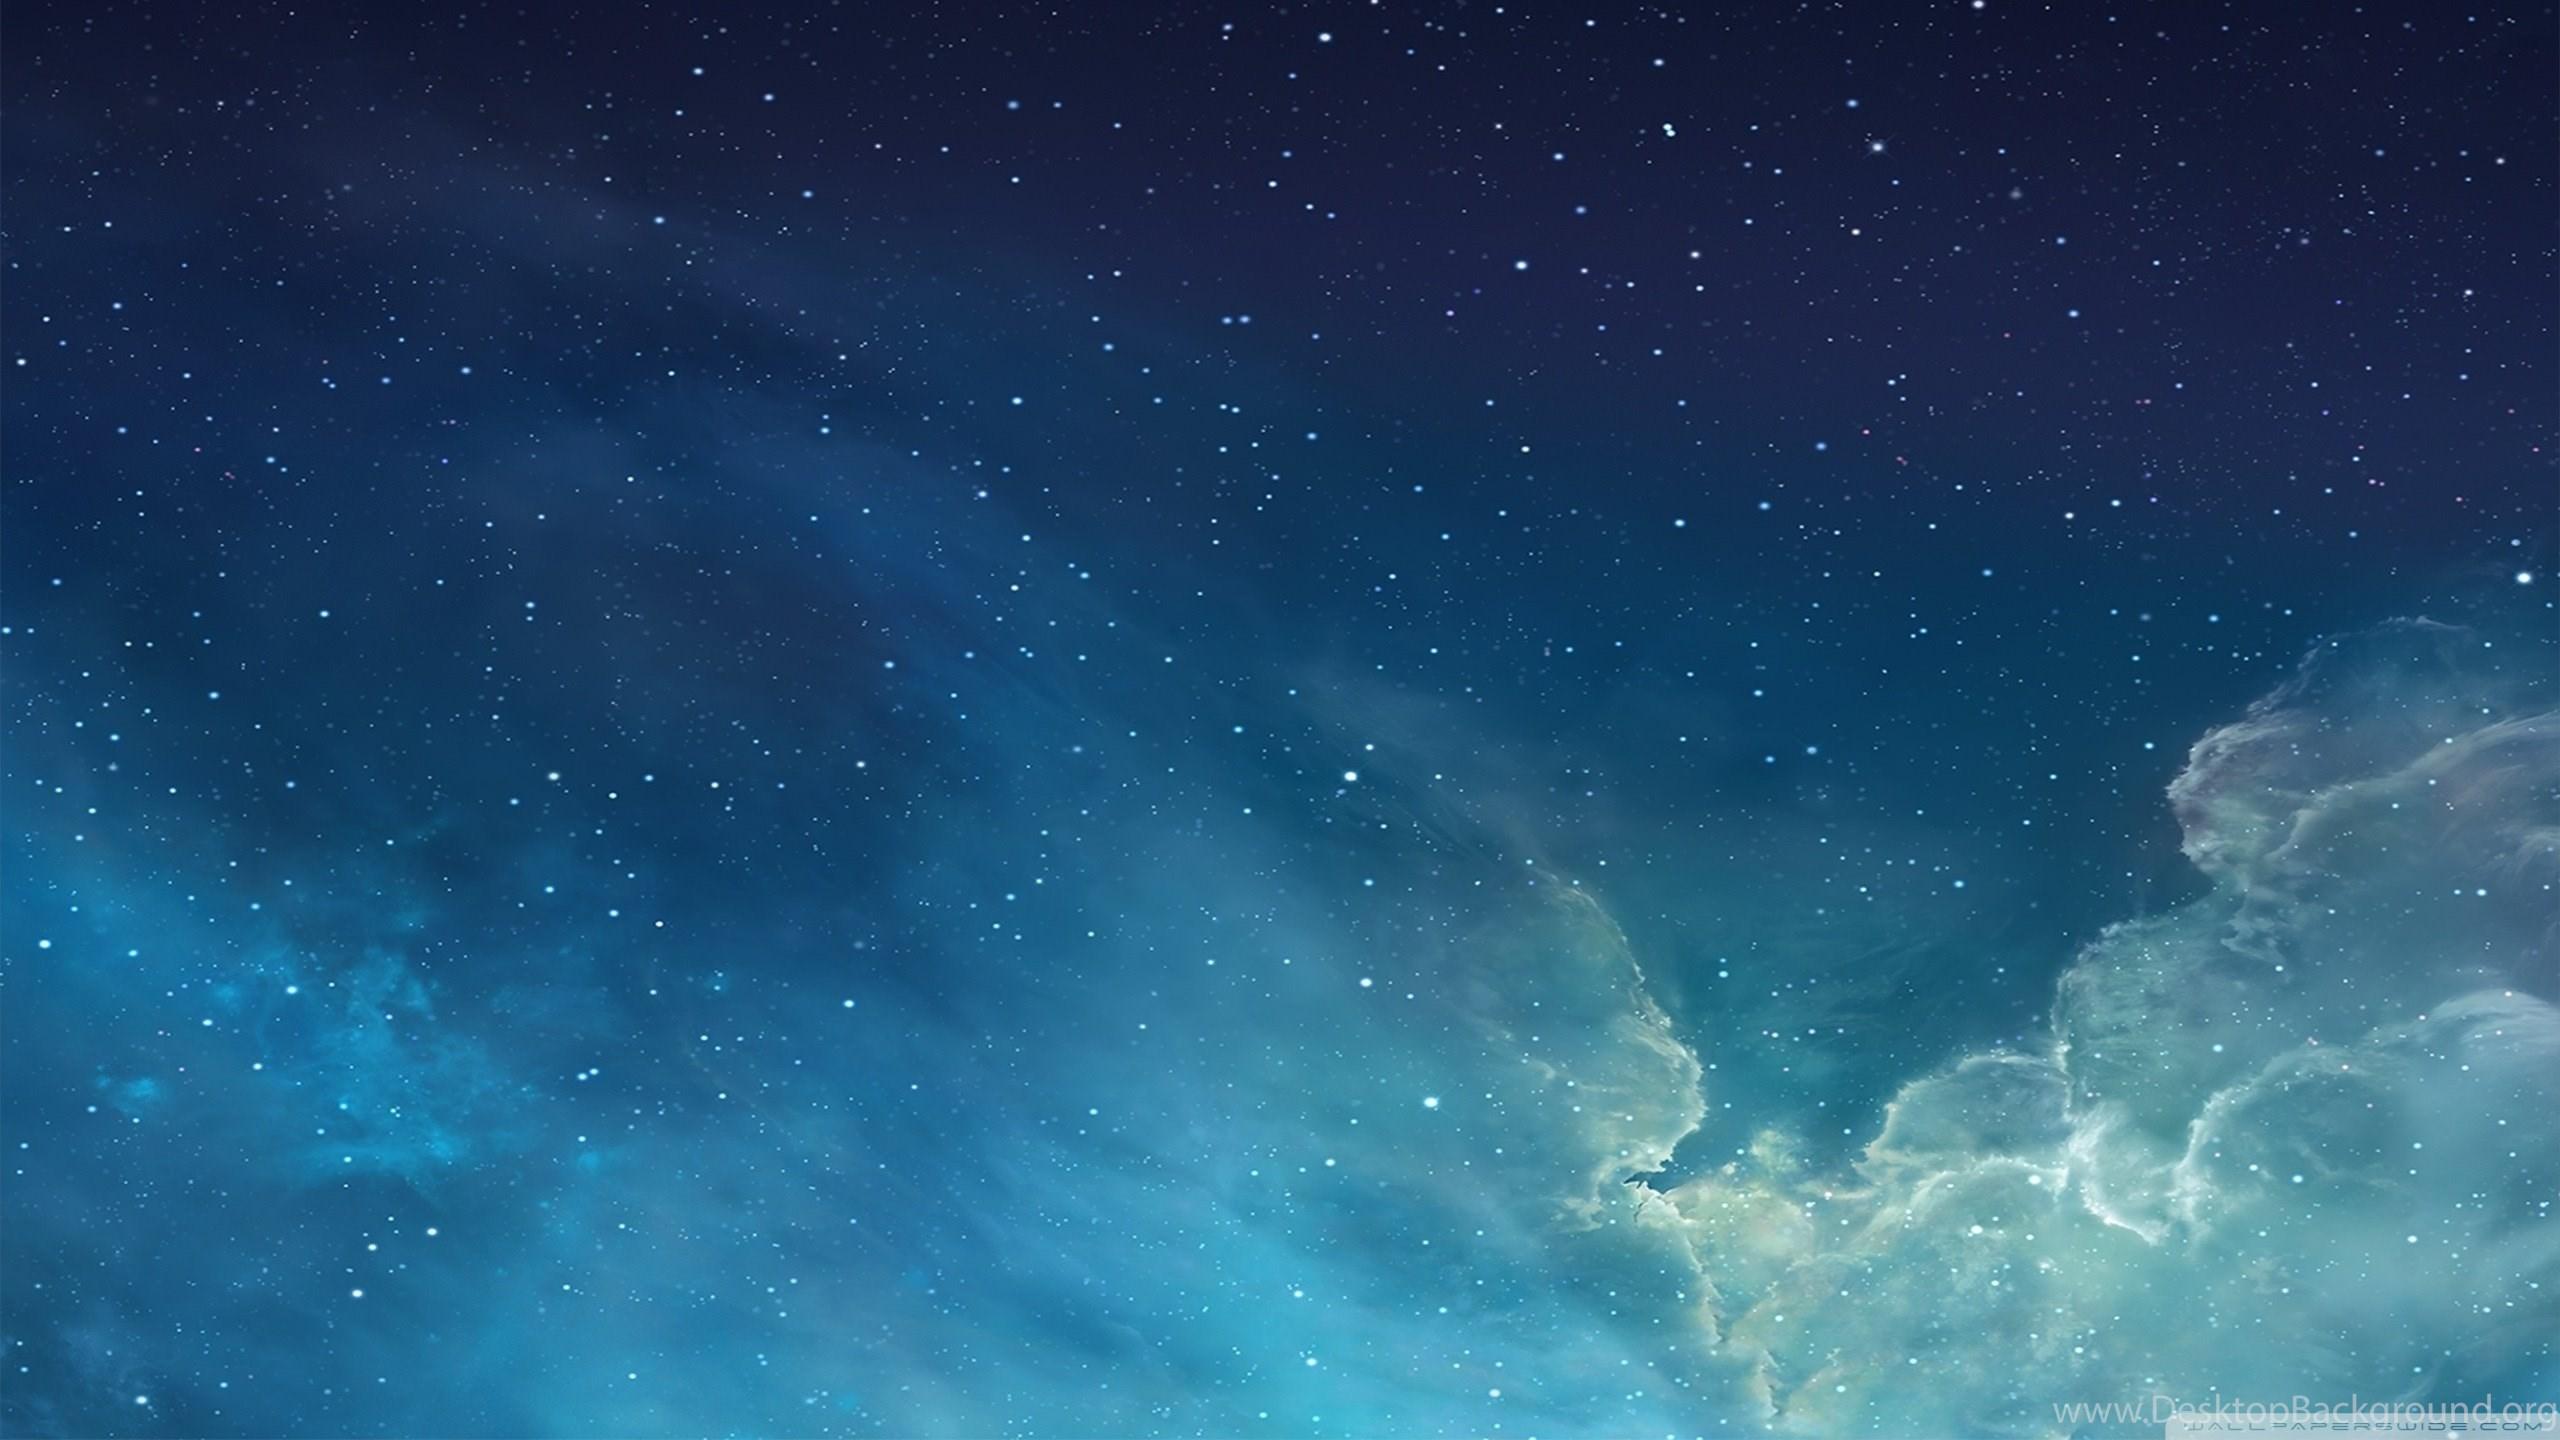 667877 ios 7 galaxy hd desktop wallpapers high definition